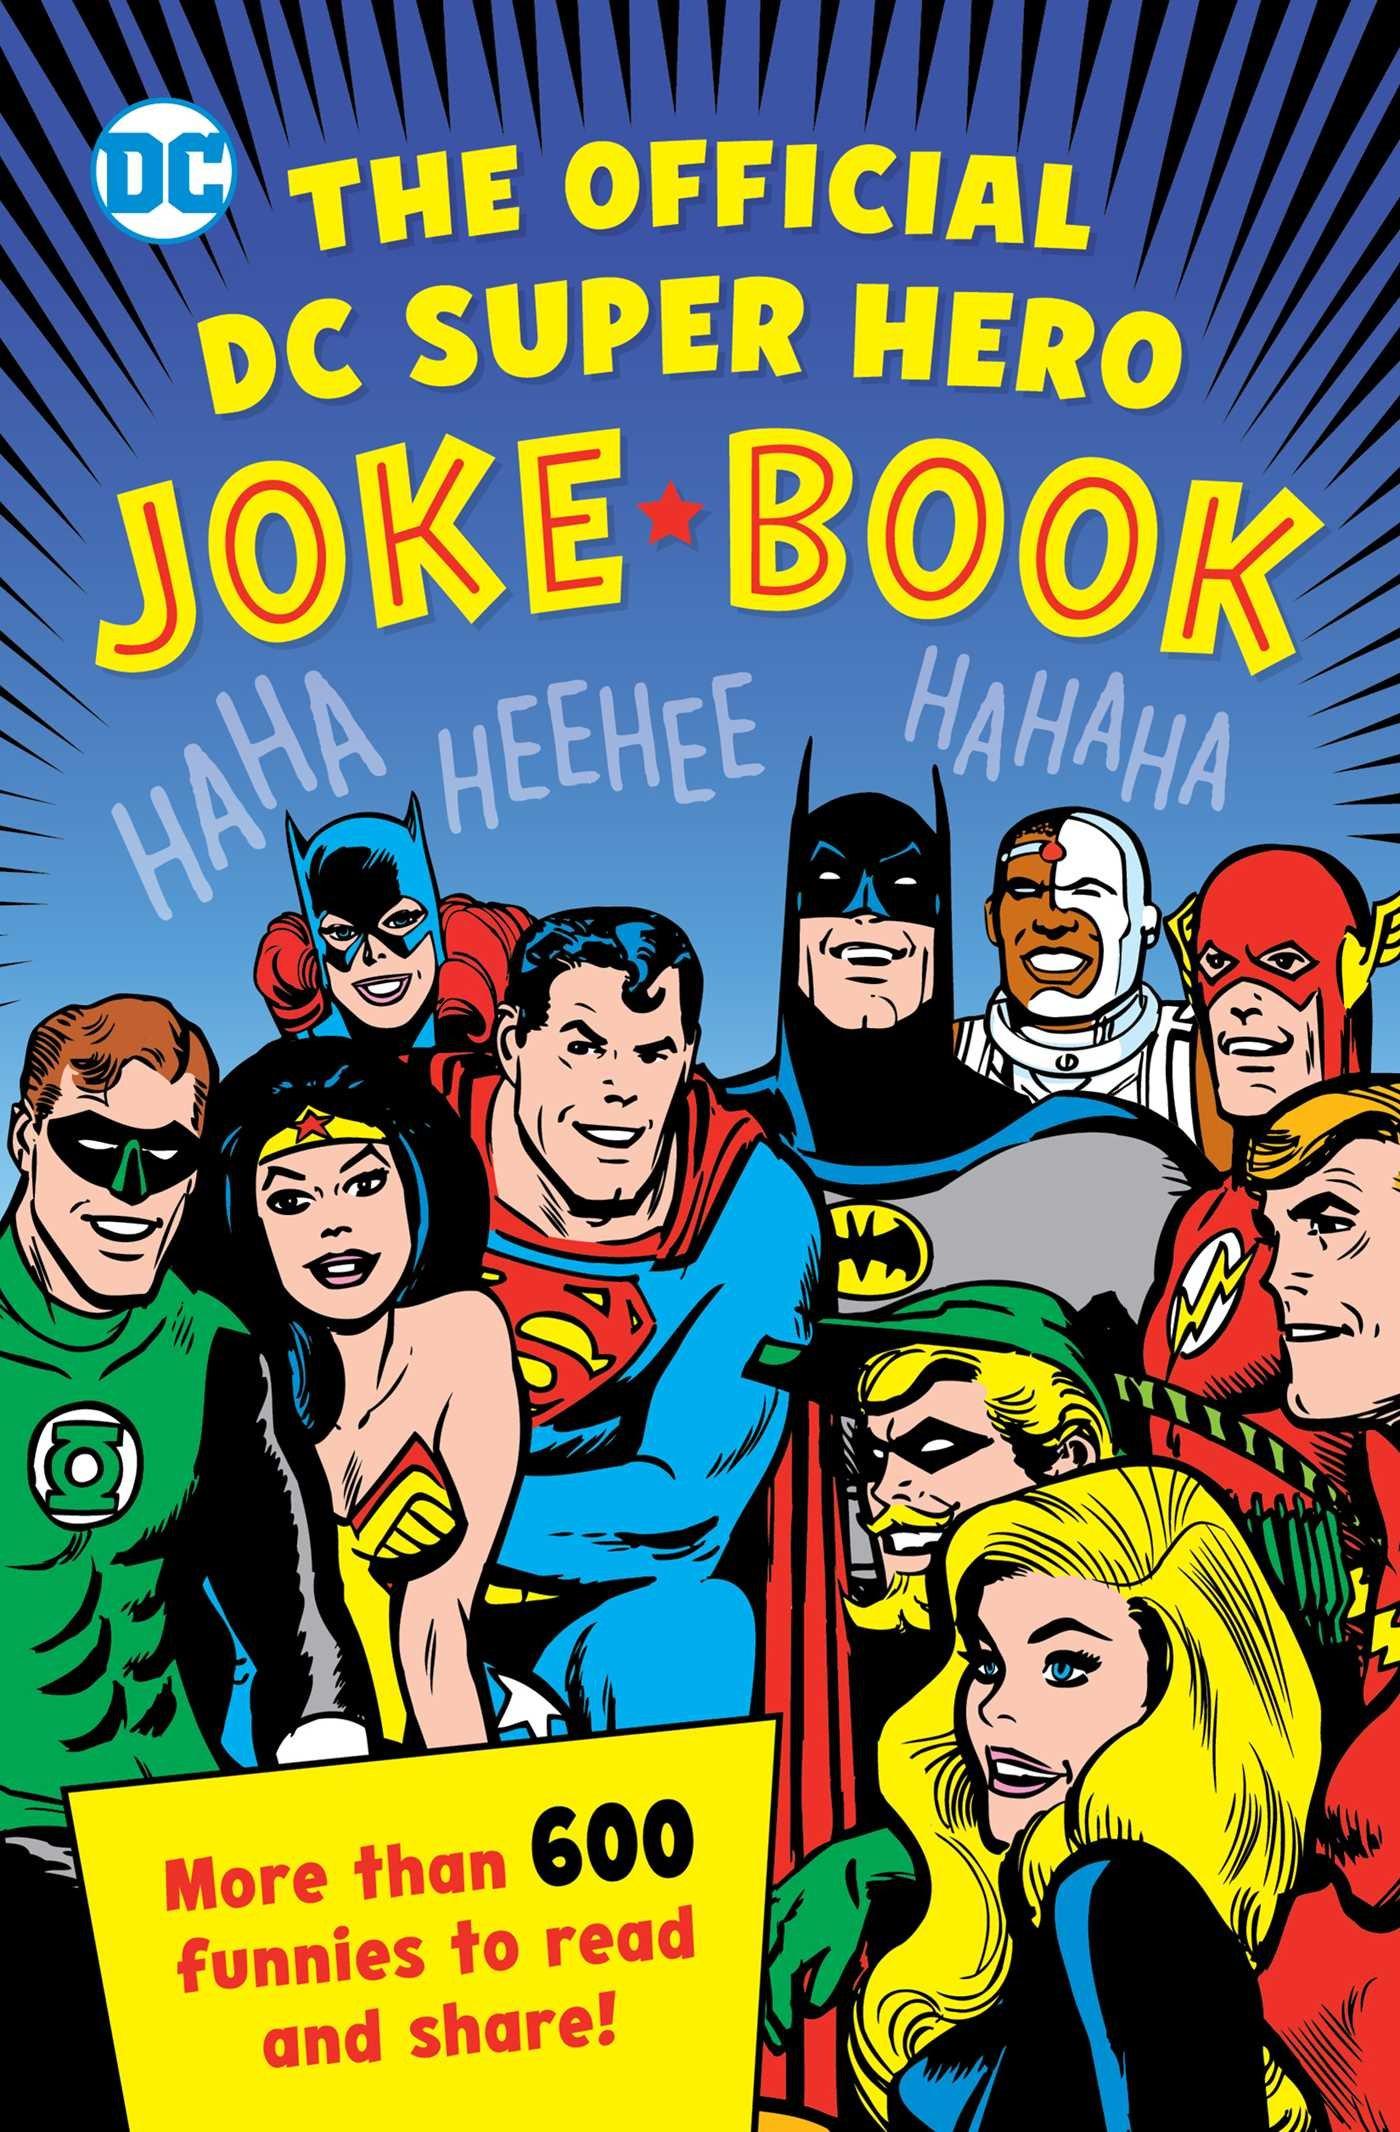 Official Super Hero Joke Heroes product image